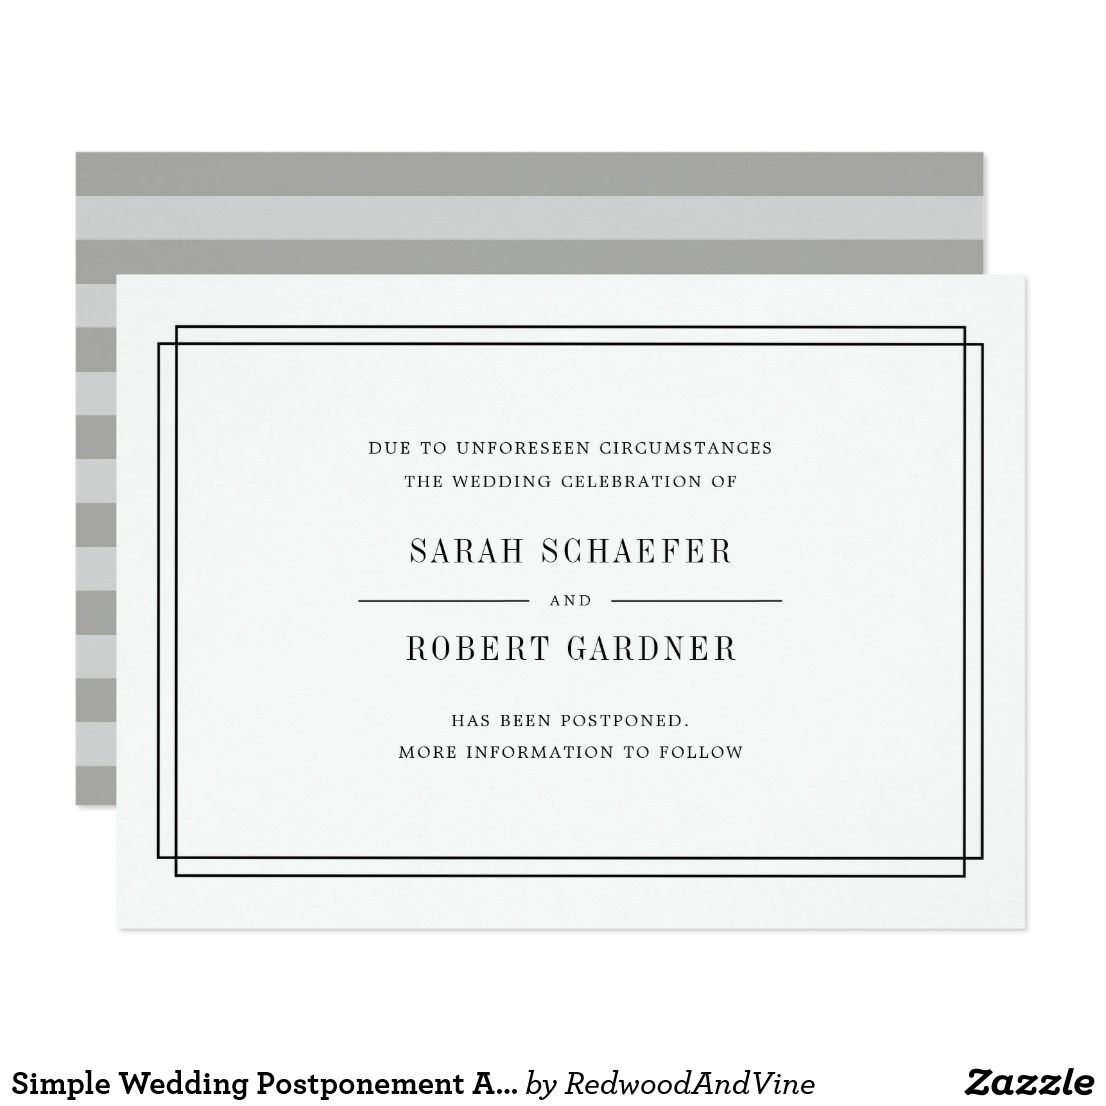 Simple Wedding Postponement Announcement Card Zazzle Com Wedding Cancellation Simple Weddings Simple Wedding Invitations